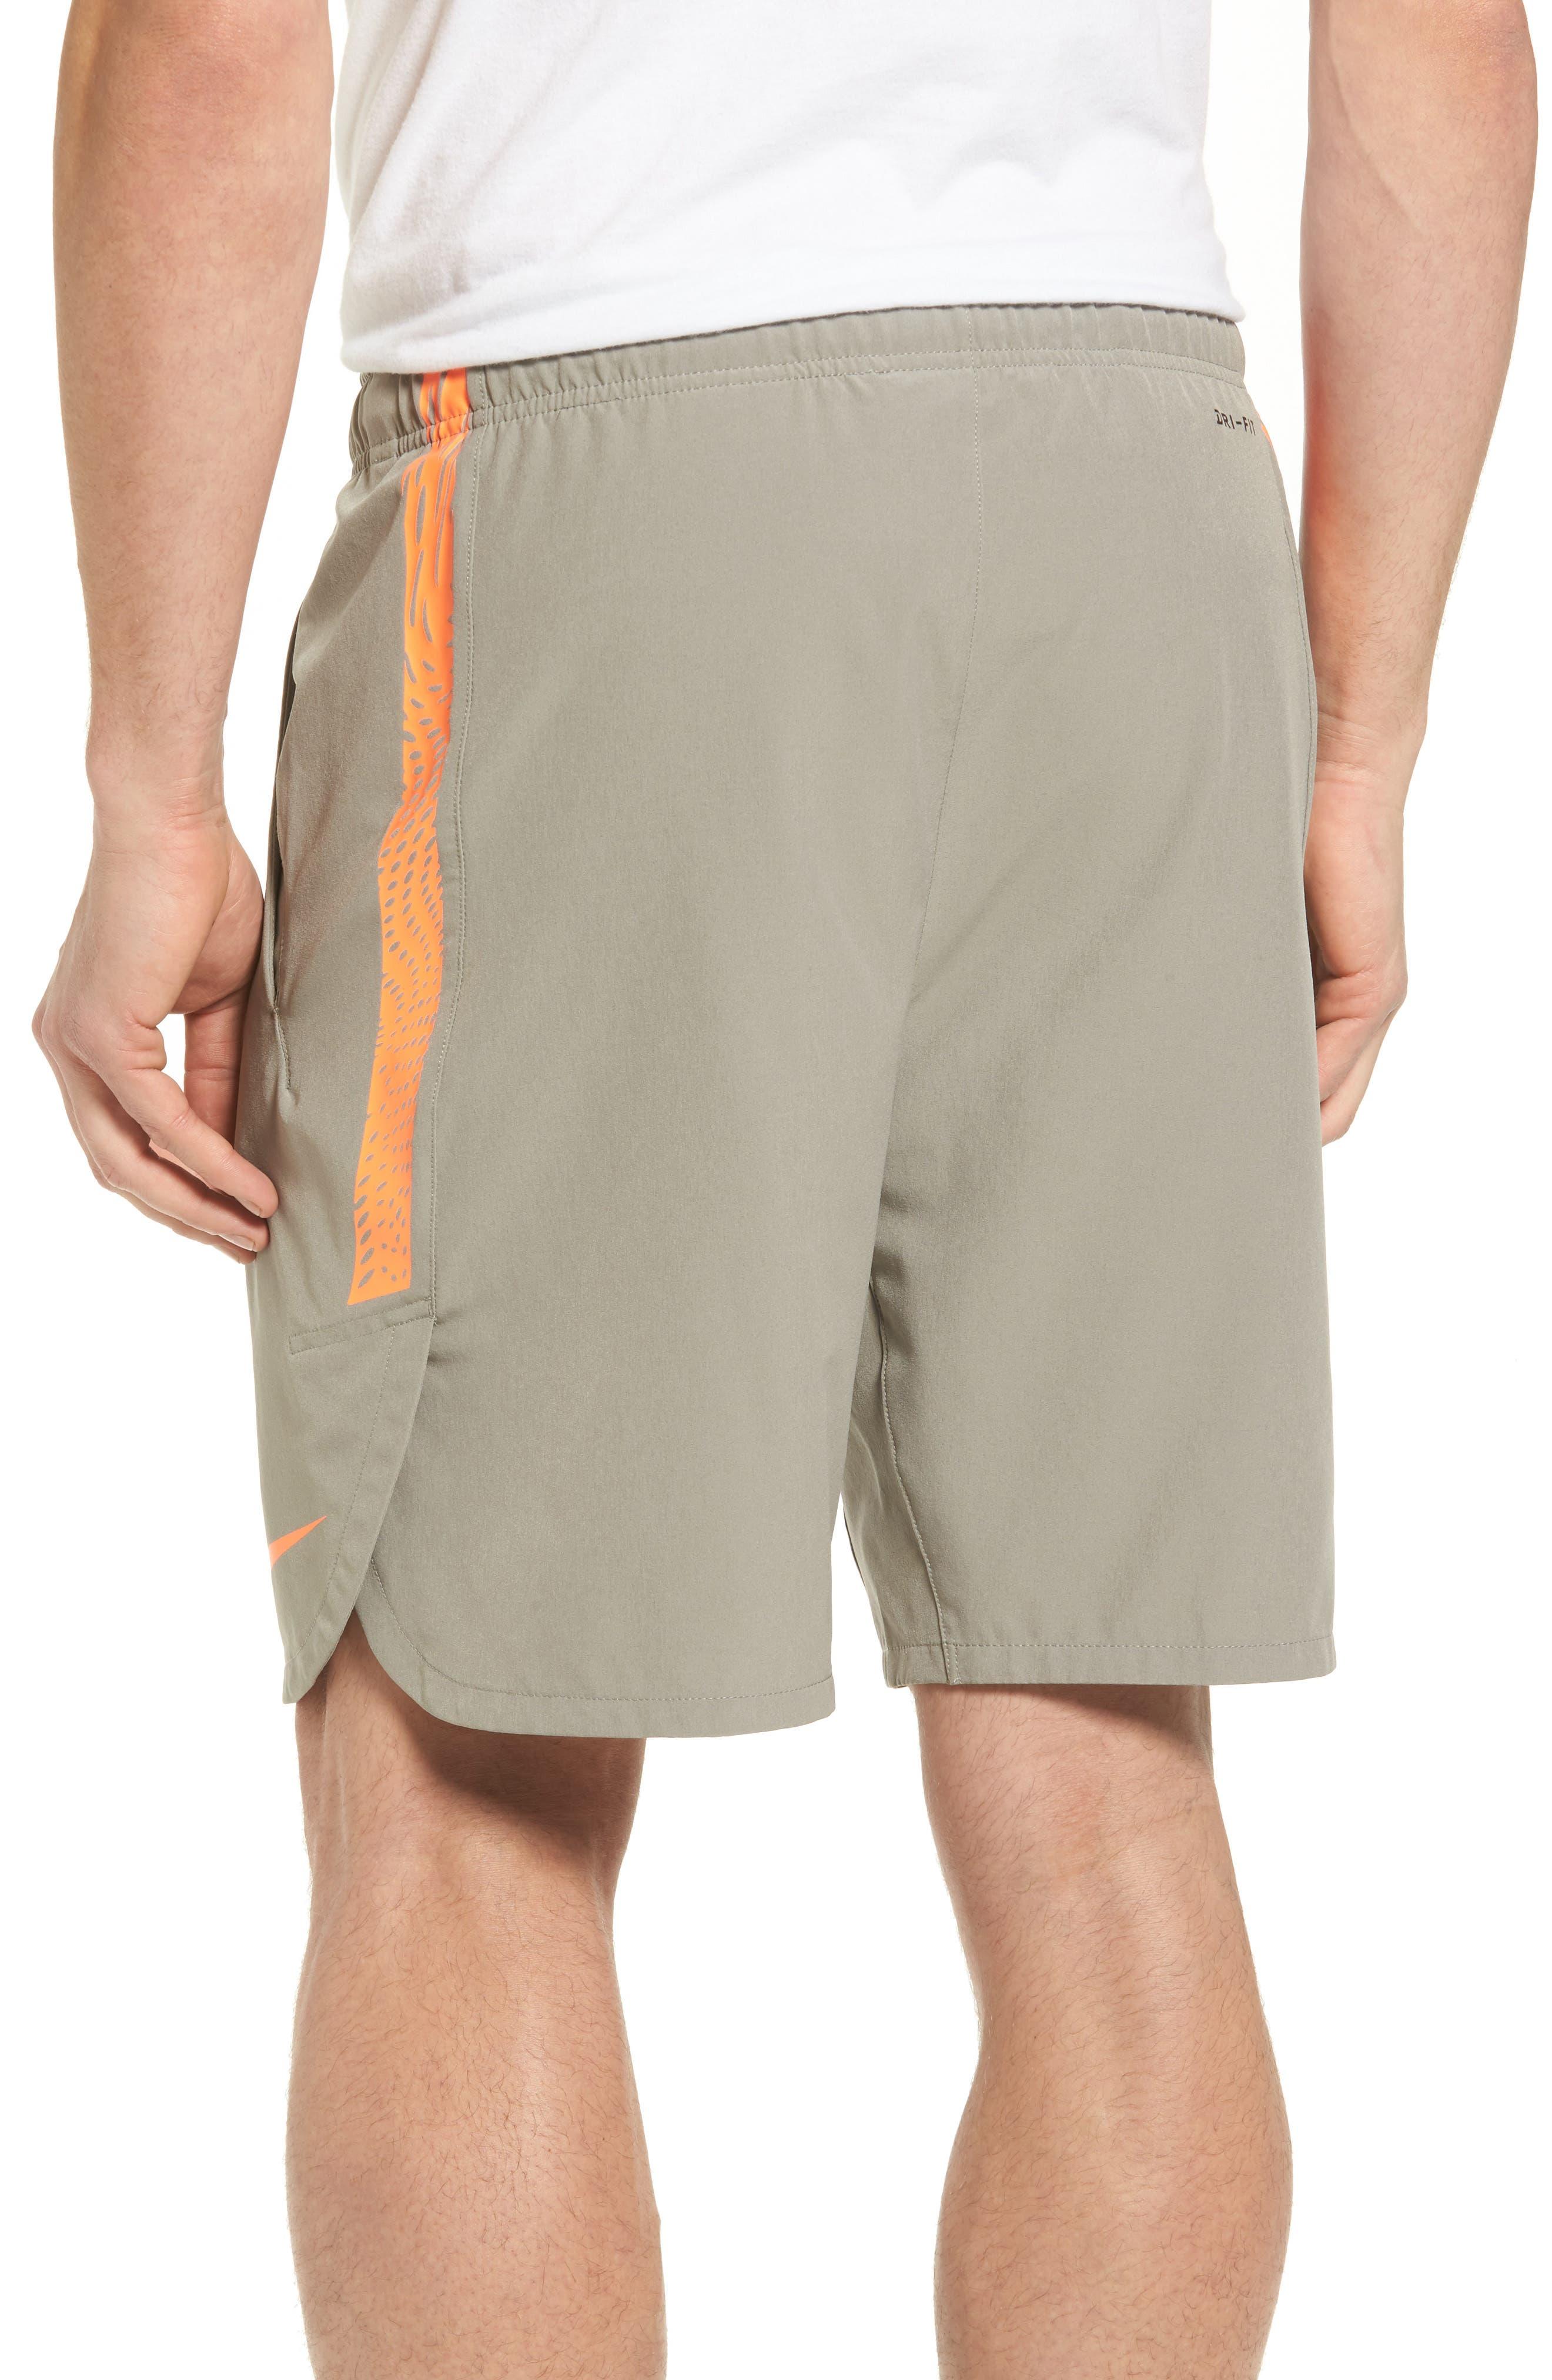 Flex Training Shorts,                             Alternate thumbnail 3, color,